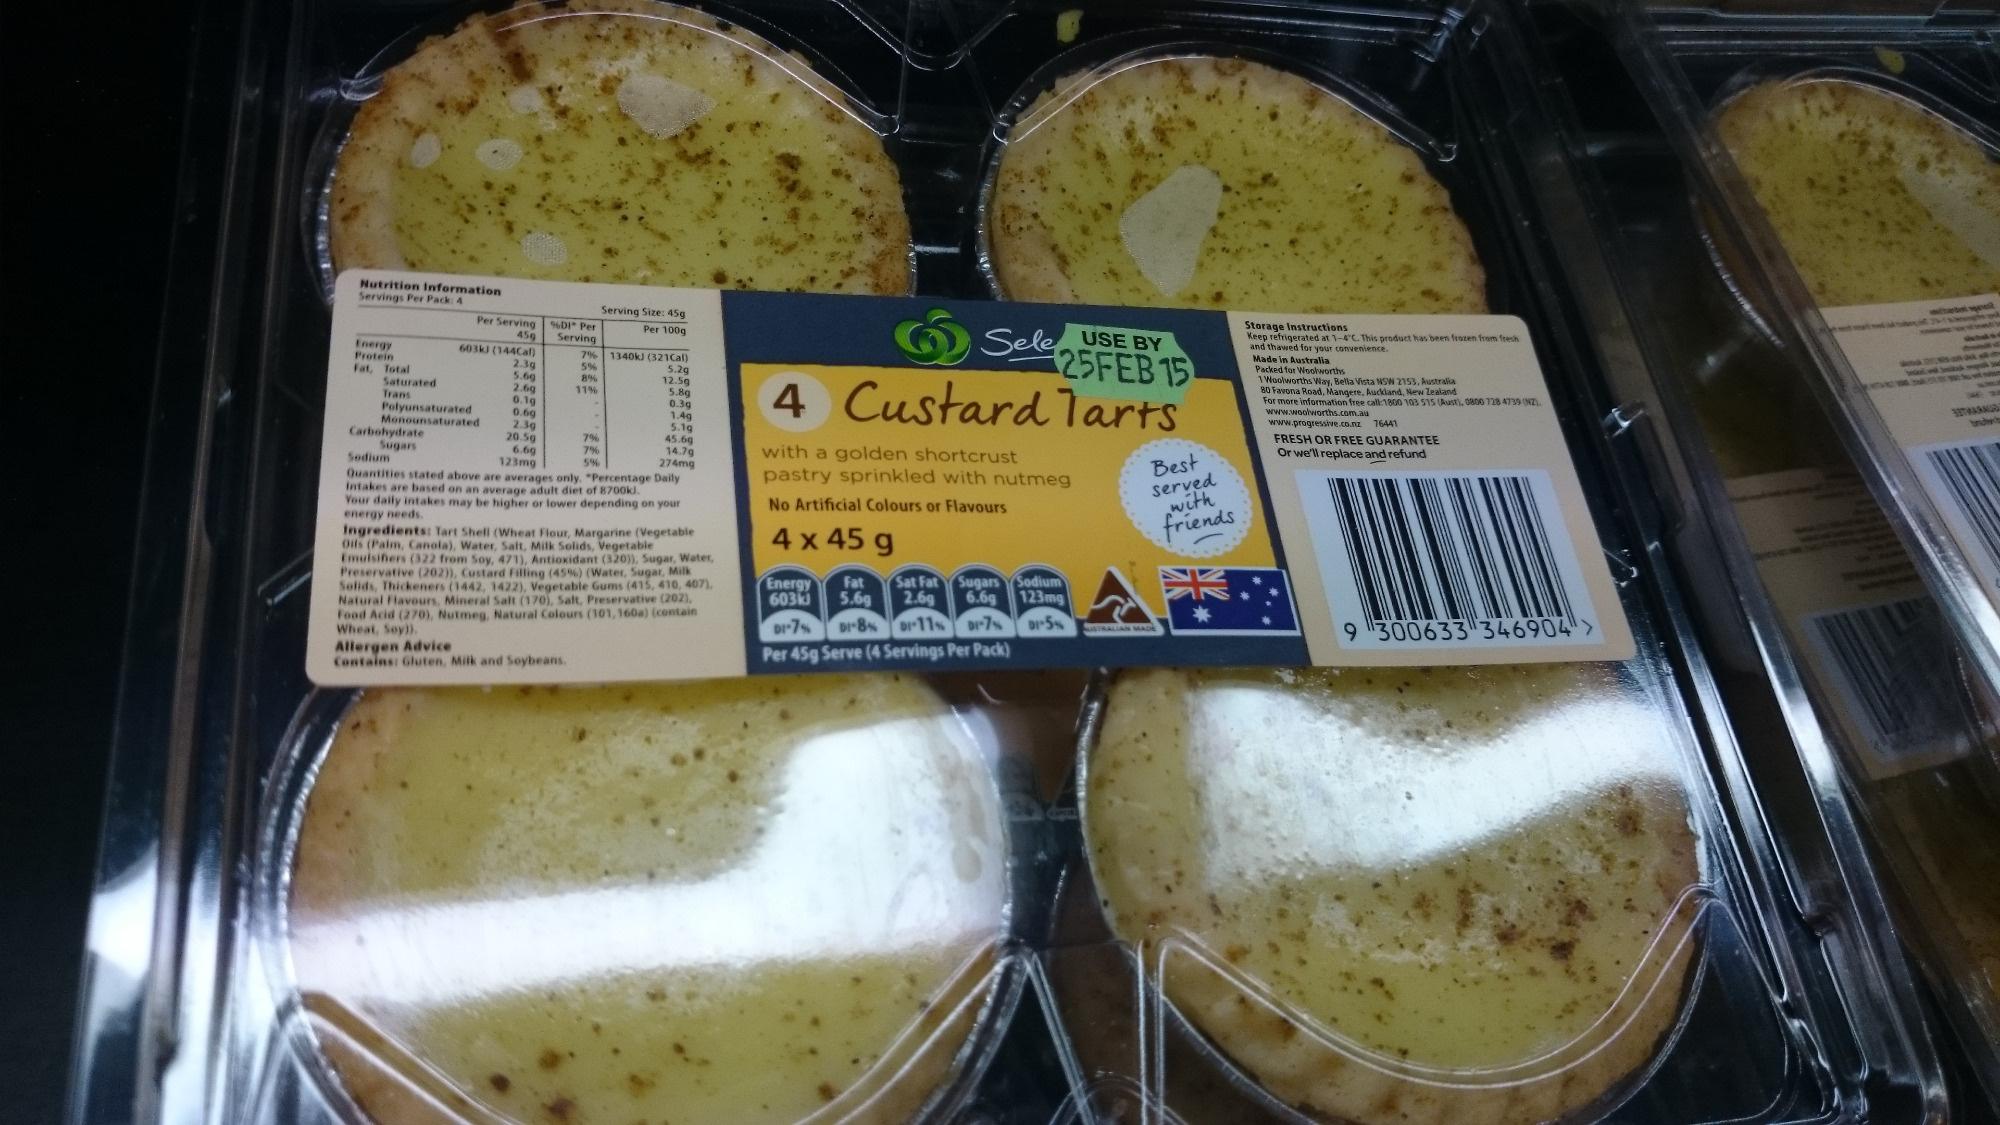 4 Custard Tarts - Product - en